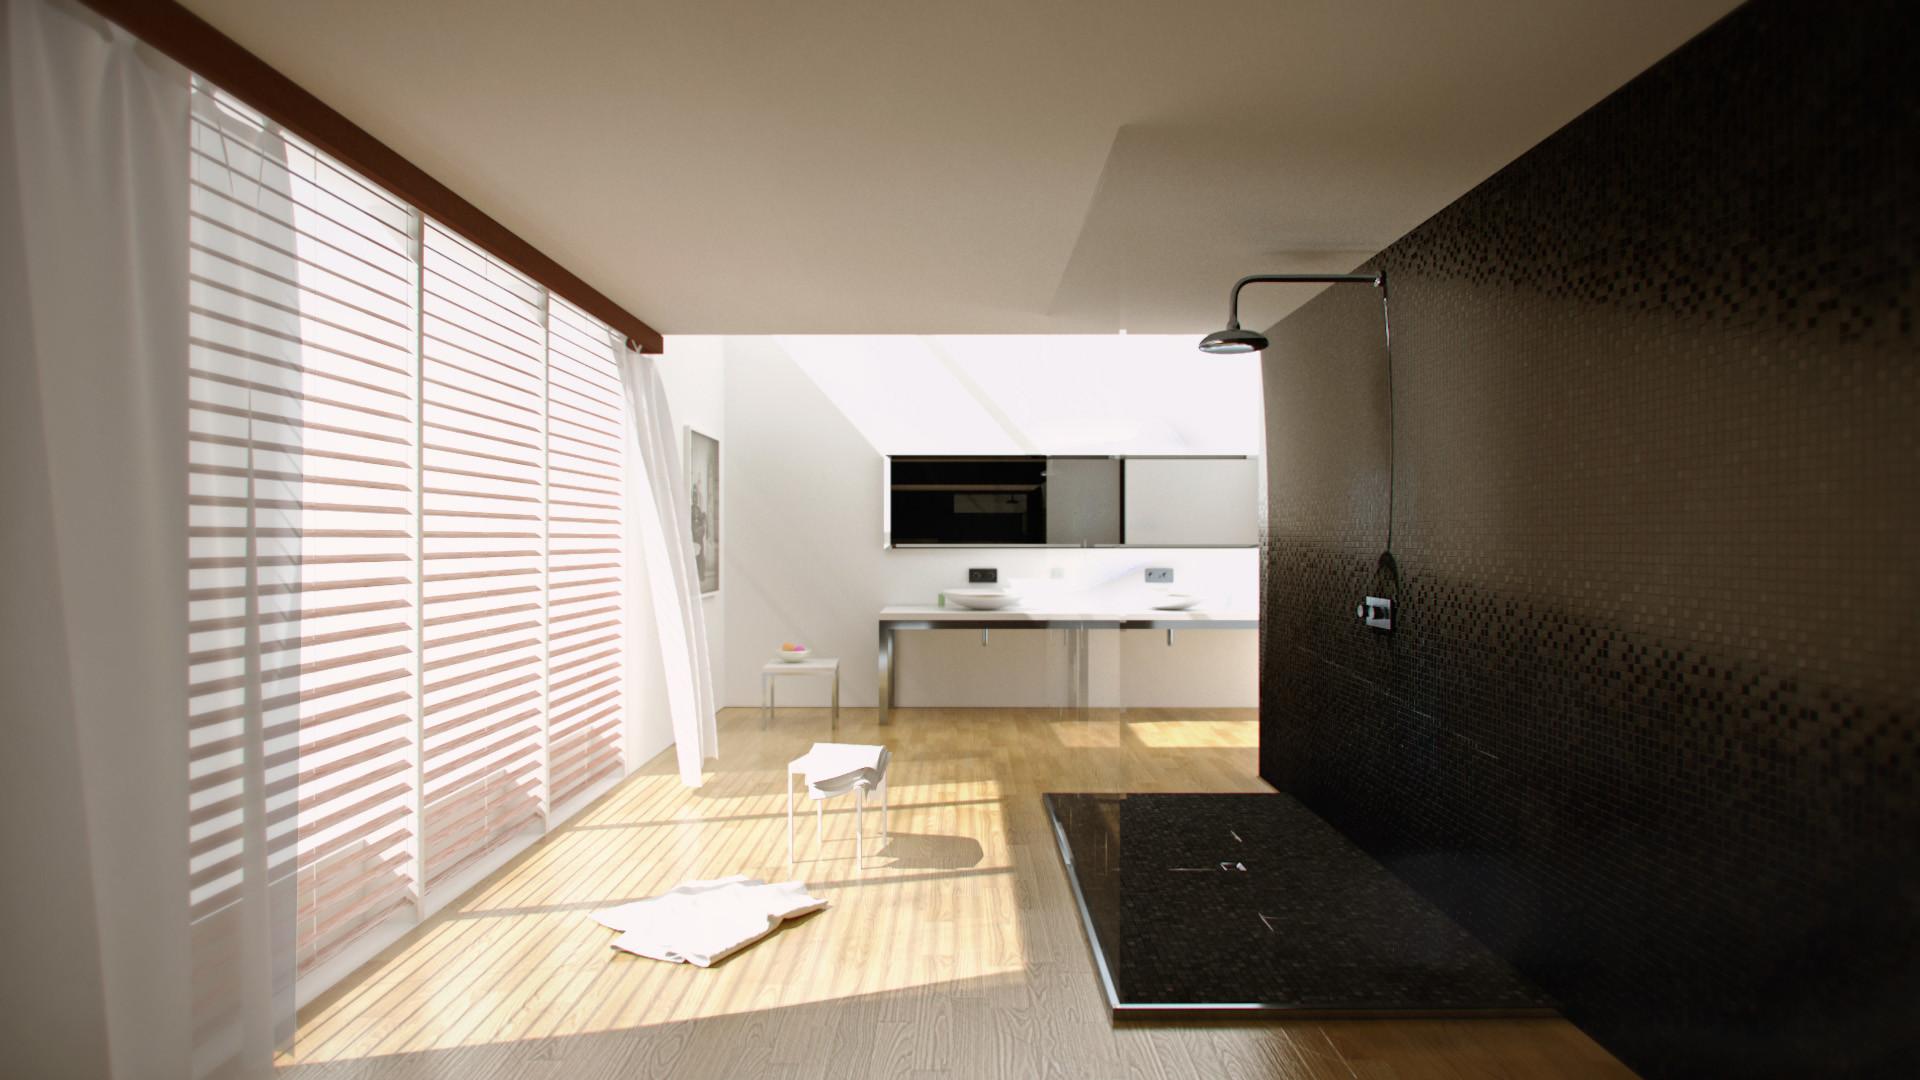 Andre mueller 2015 45 bathroom